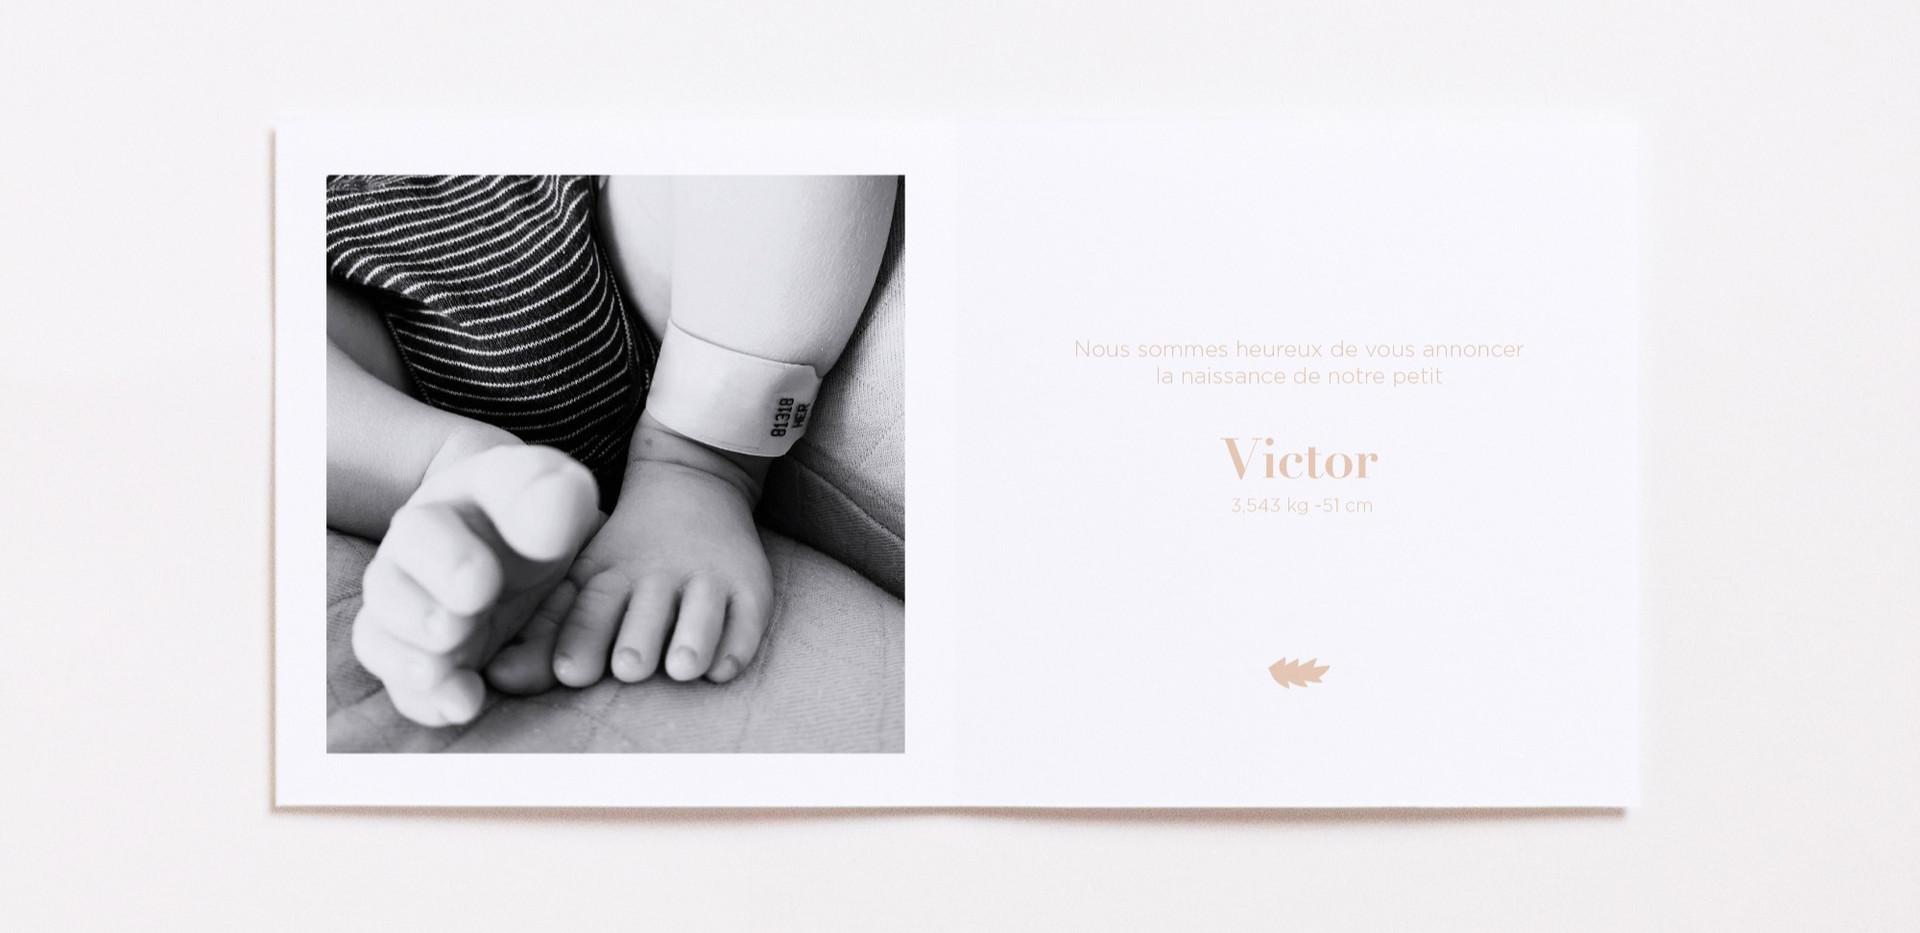 VICTOR_edited.jpg